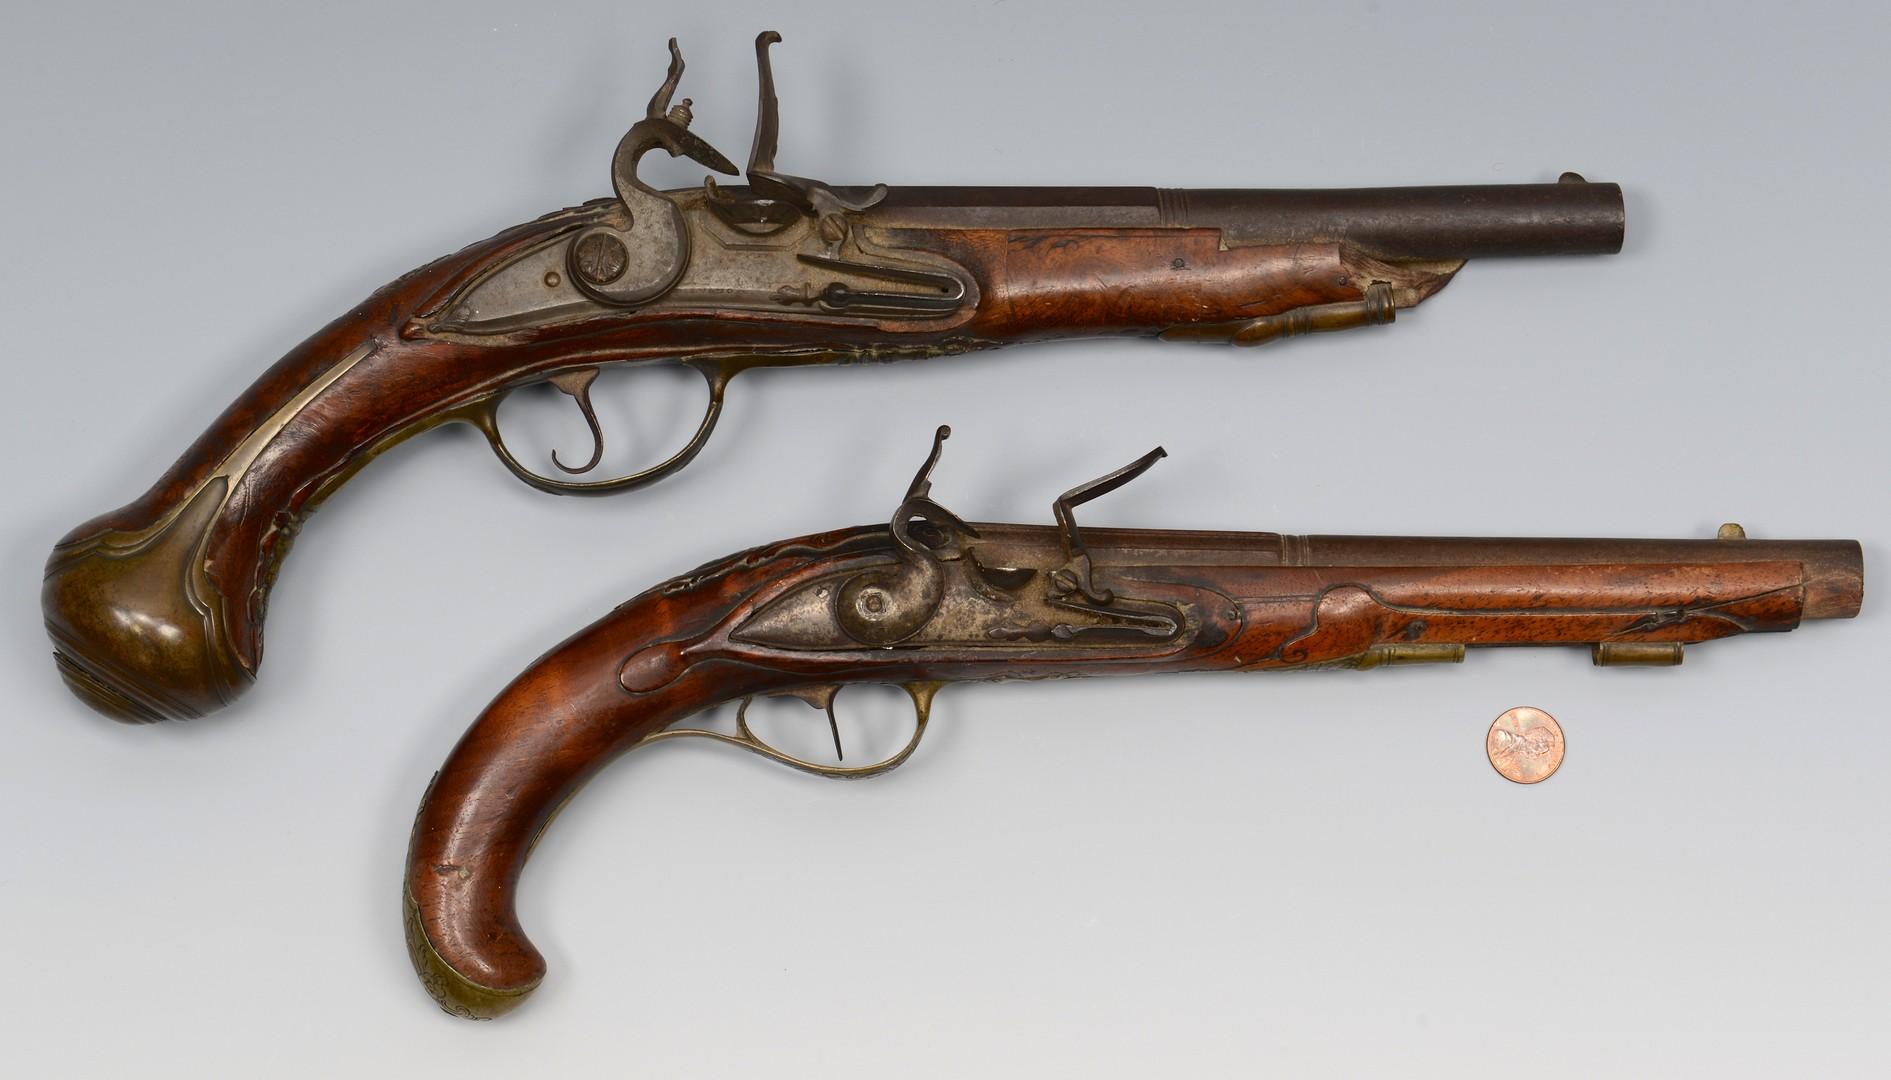 Lot 192: 2 Flintlock pistols, one Geromino Fernandez